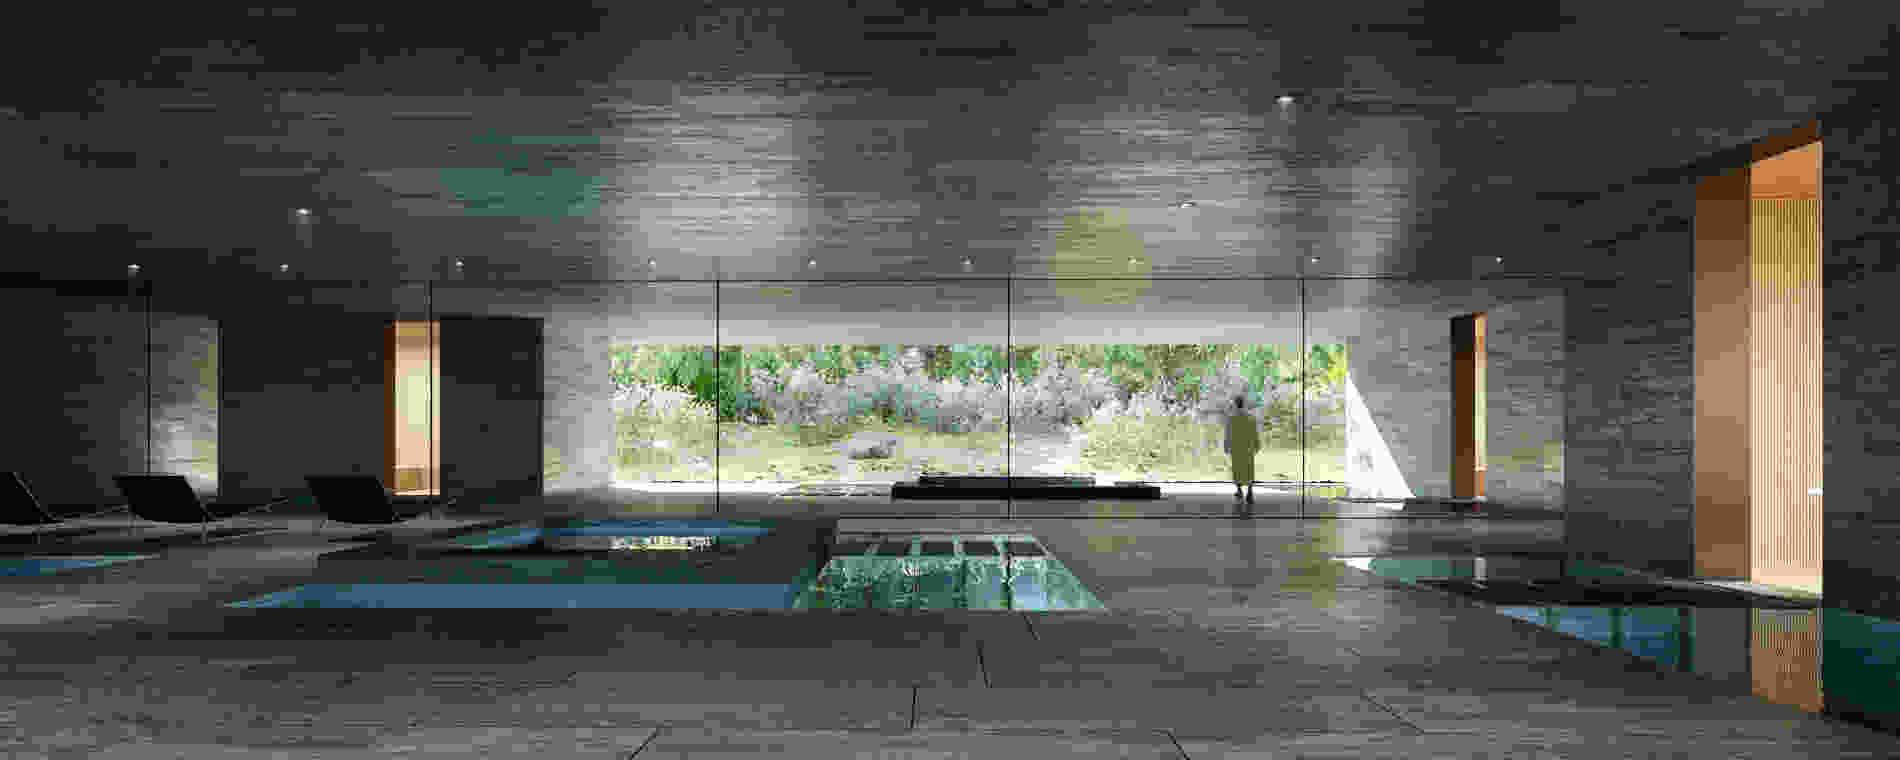 376 Walkerhill Seoul dm vis 008 sauna